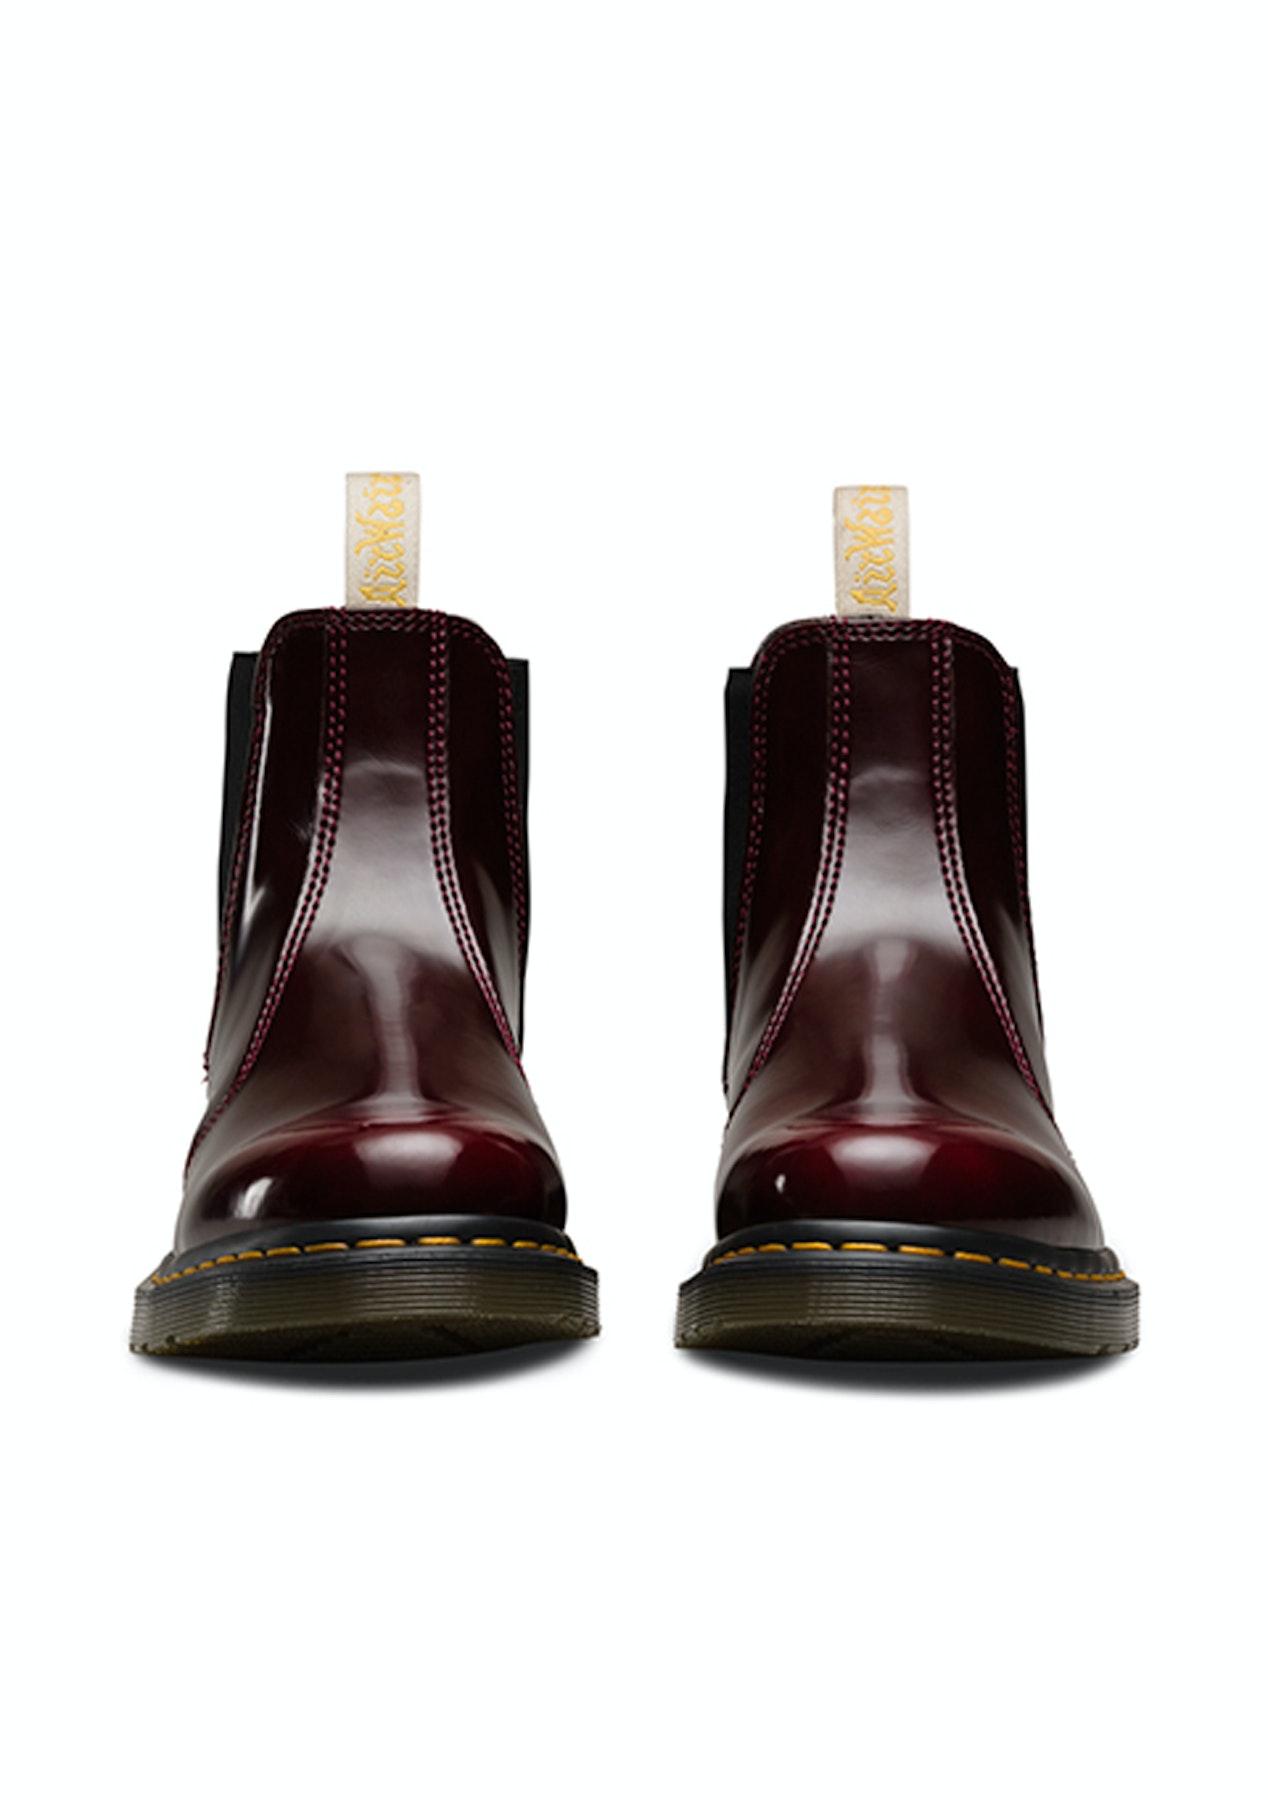 ca902de8 Dr Martens - 2976 Vegan Chelsea Boot - Cherry Red - Dr Martens - Onceit